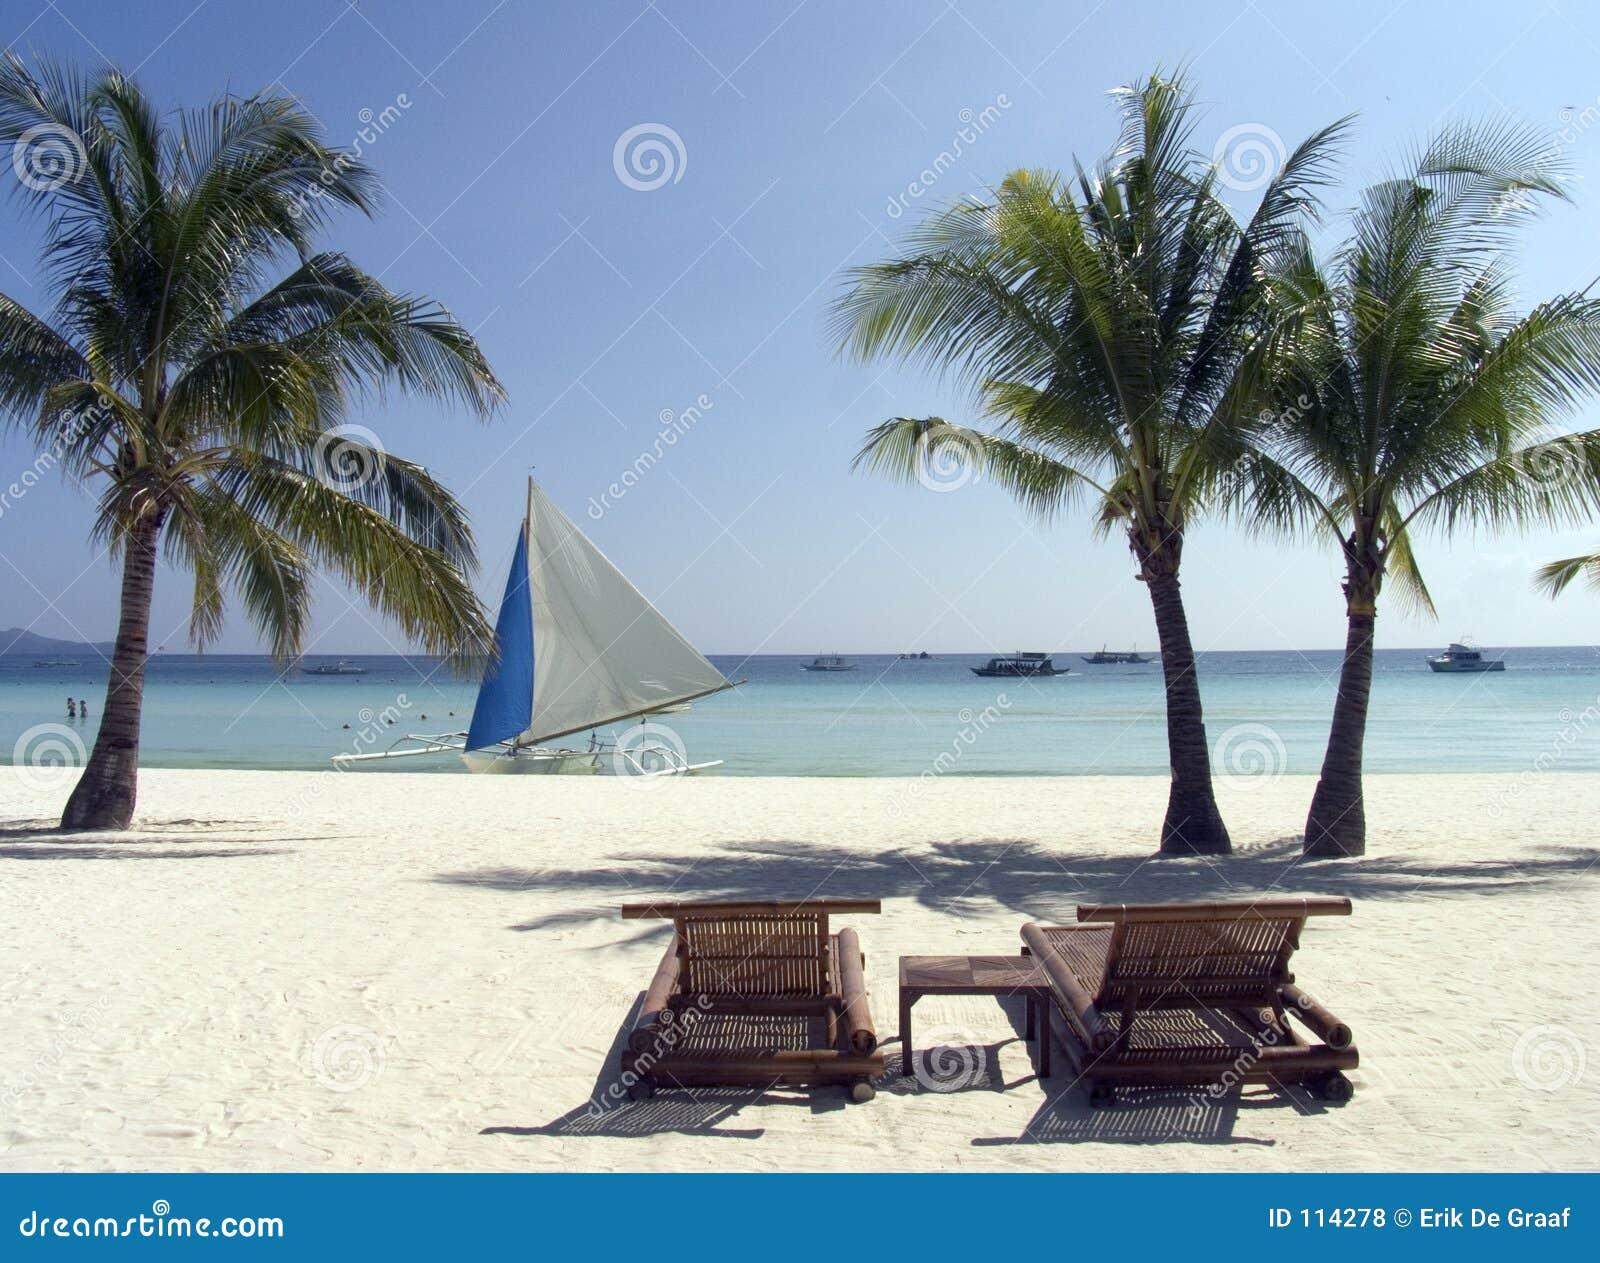 Boracay Beach 8 Royalty Free Stock Photos Image 114278